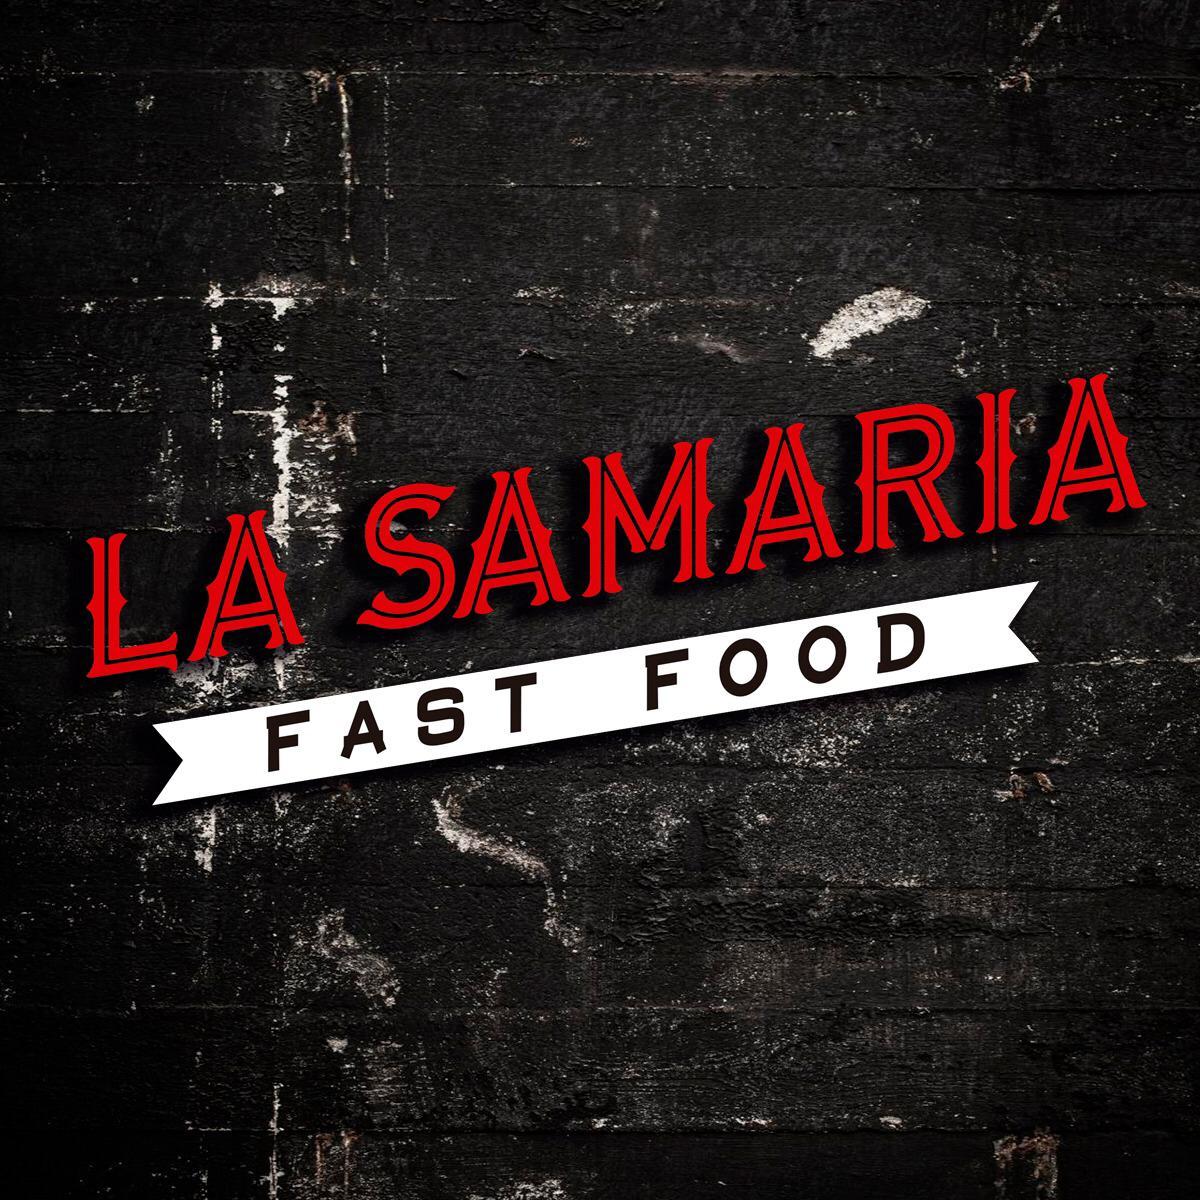 La Samaria Fast Food